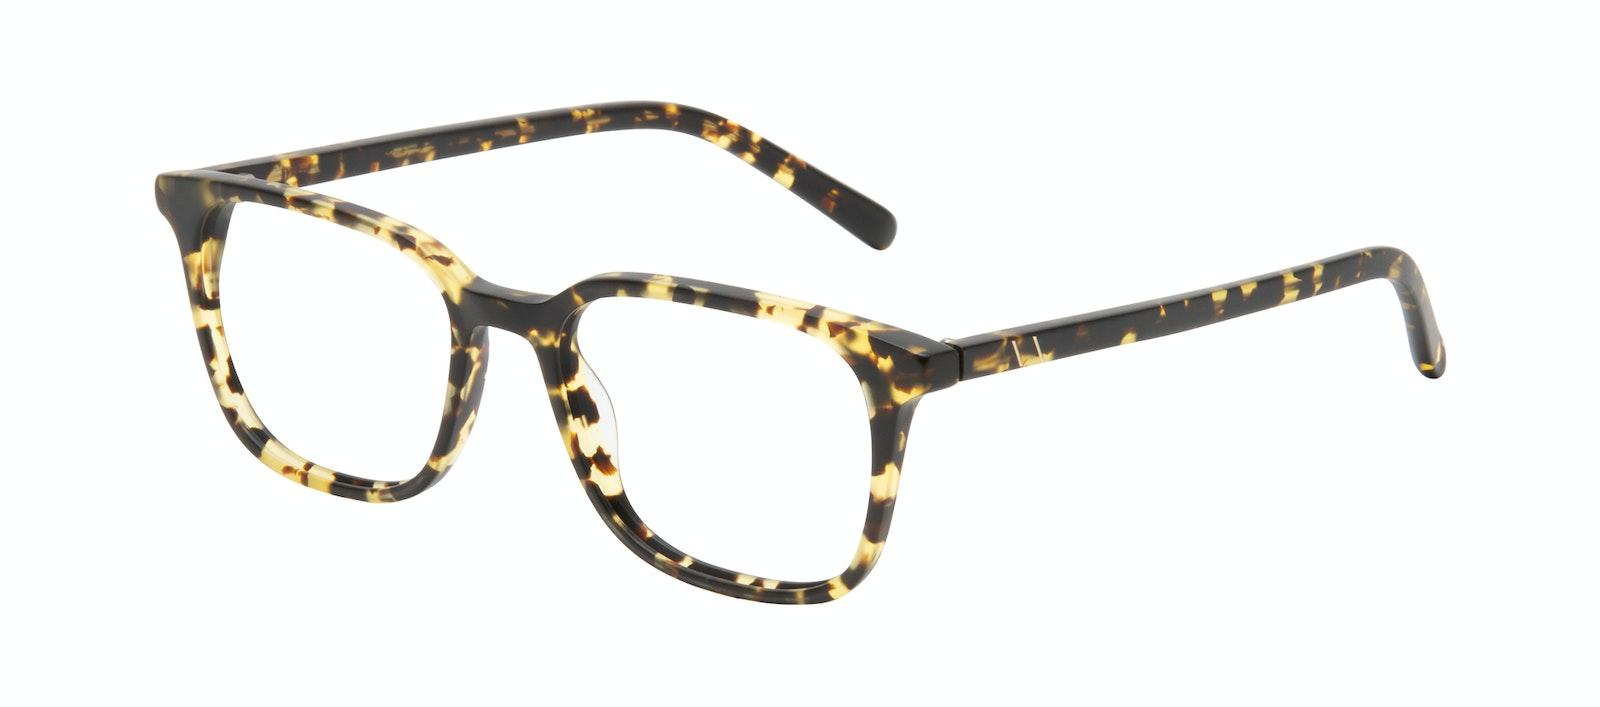 Affordable Fashion Glasses Square Eyeglasses Men Choice Tortoise Matte Tilt